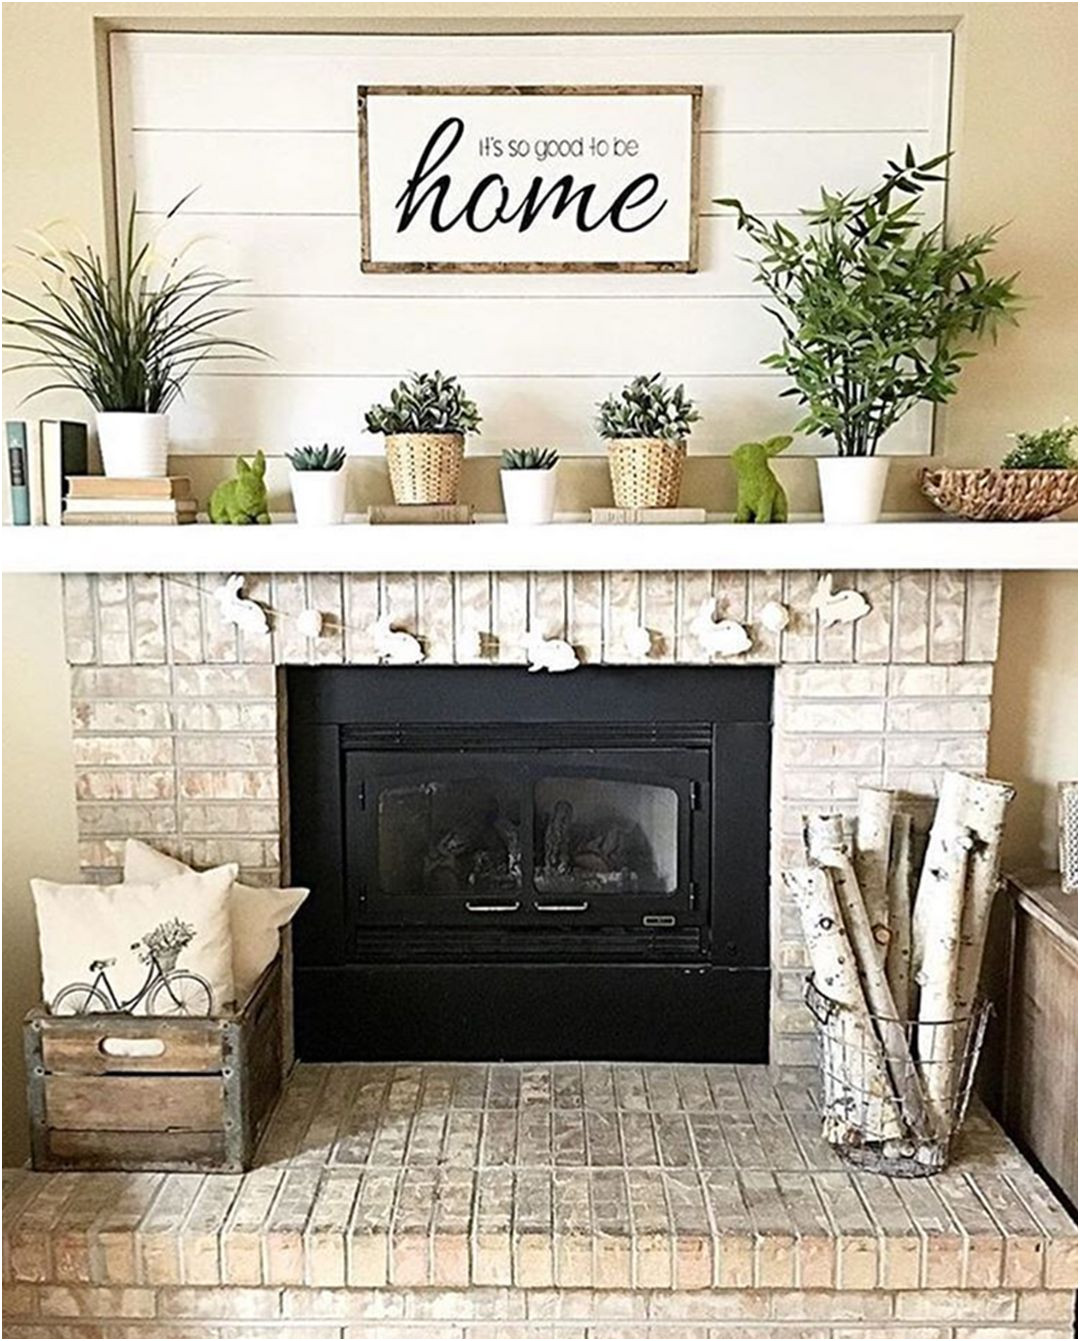 Fireplace Mantel Decor Ideas New Farmhouse Fireplace Mantel Decor Decor It S